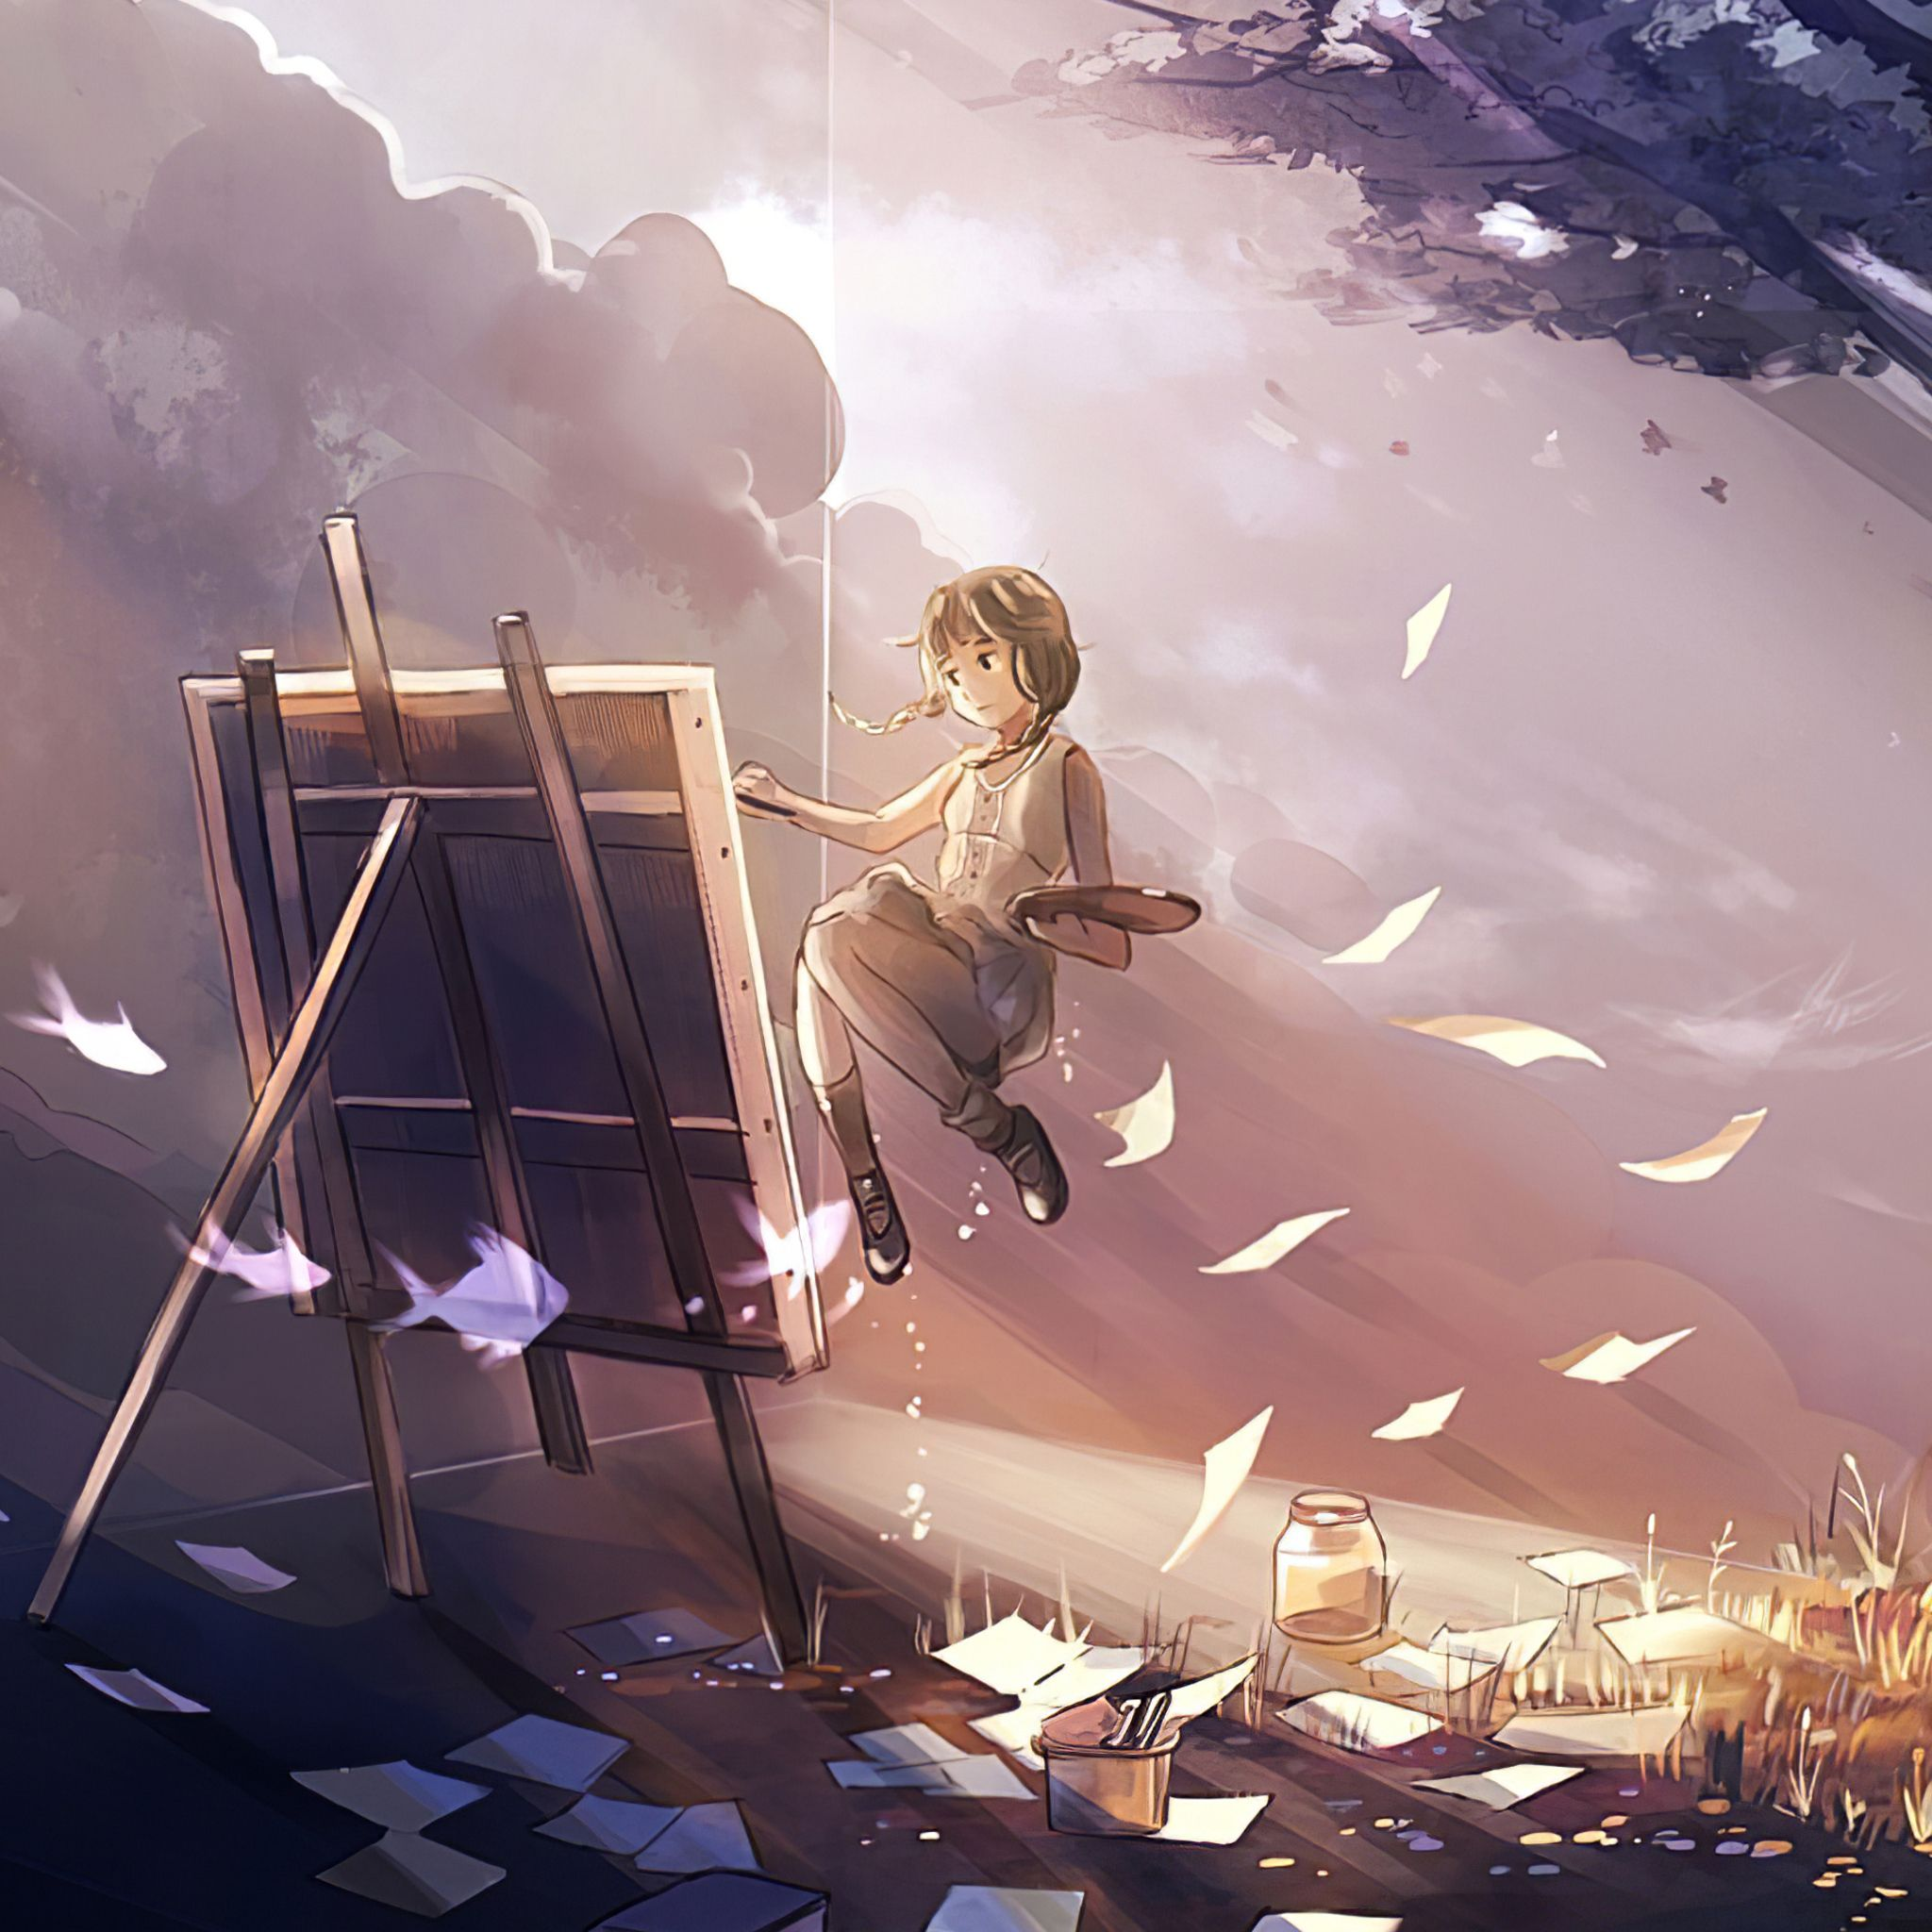 Anime Nature 4K Wallpapers - Top Free Anime Nature 4K ...